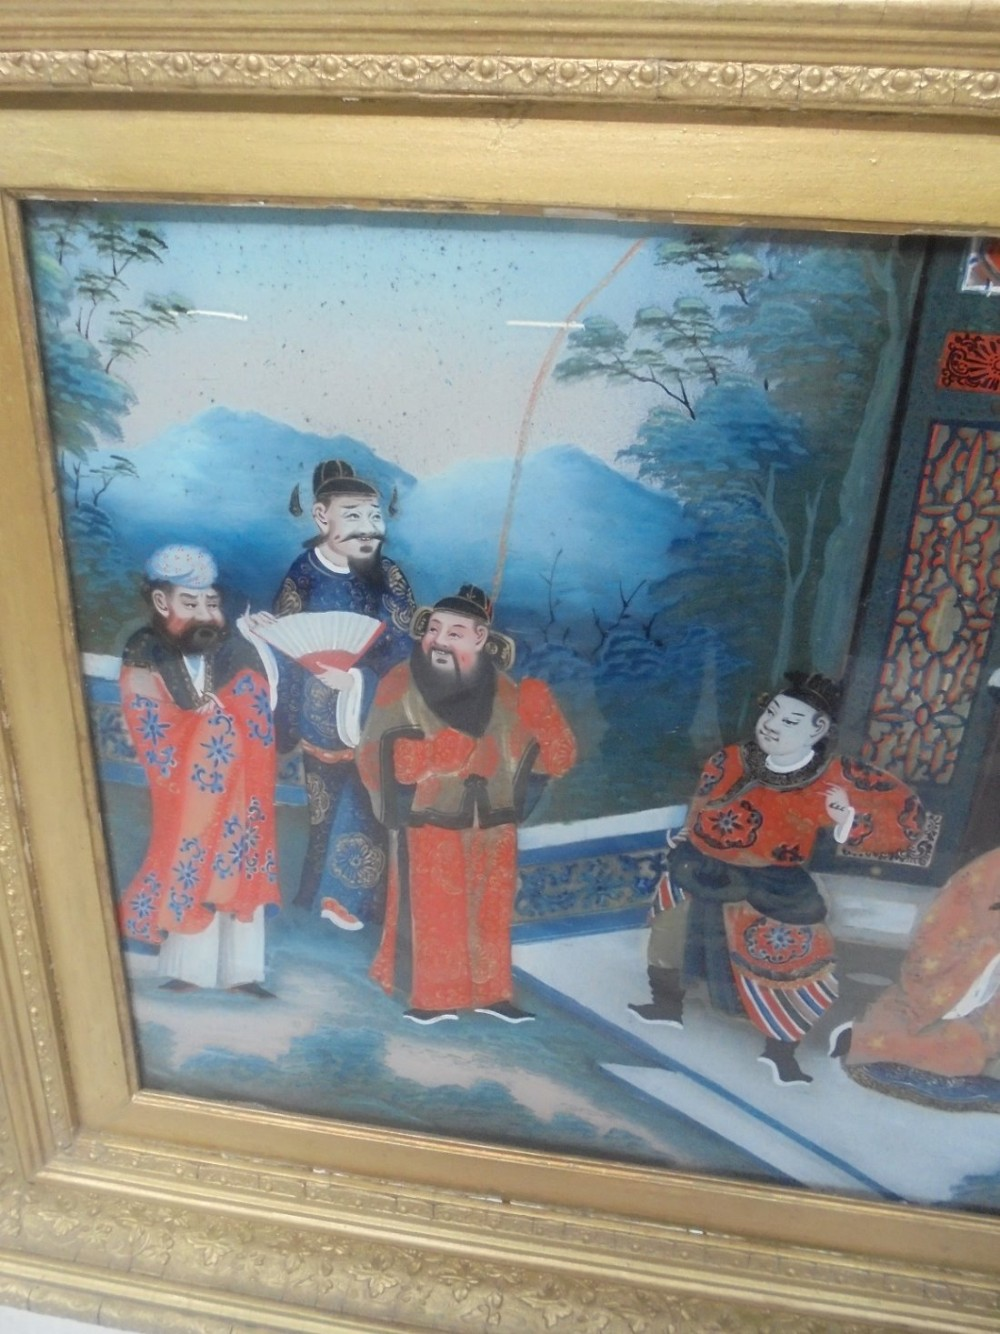 Chinese Export Reverse Glass Painting 484721 Sellingantiques Co Uk